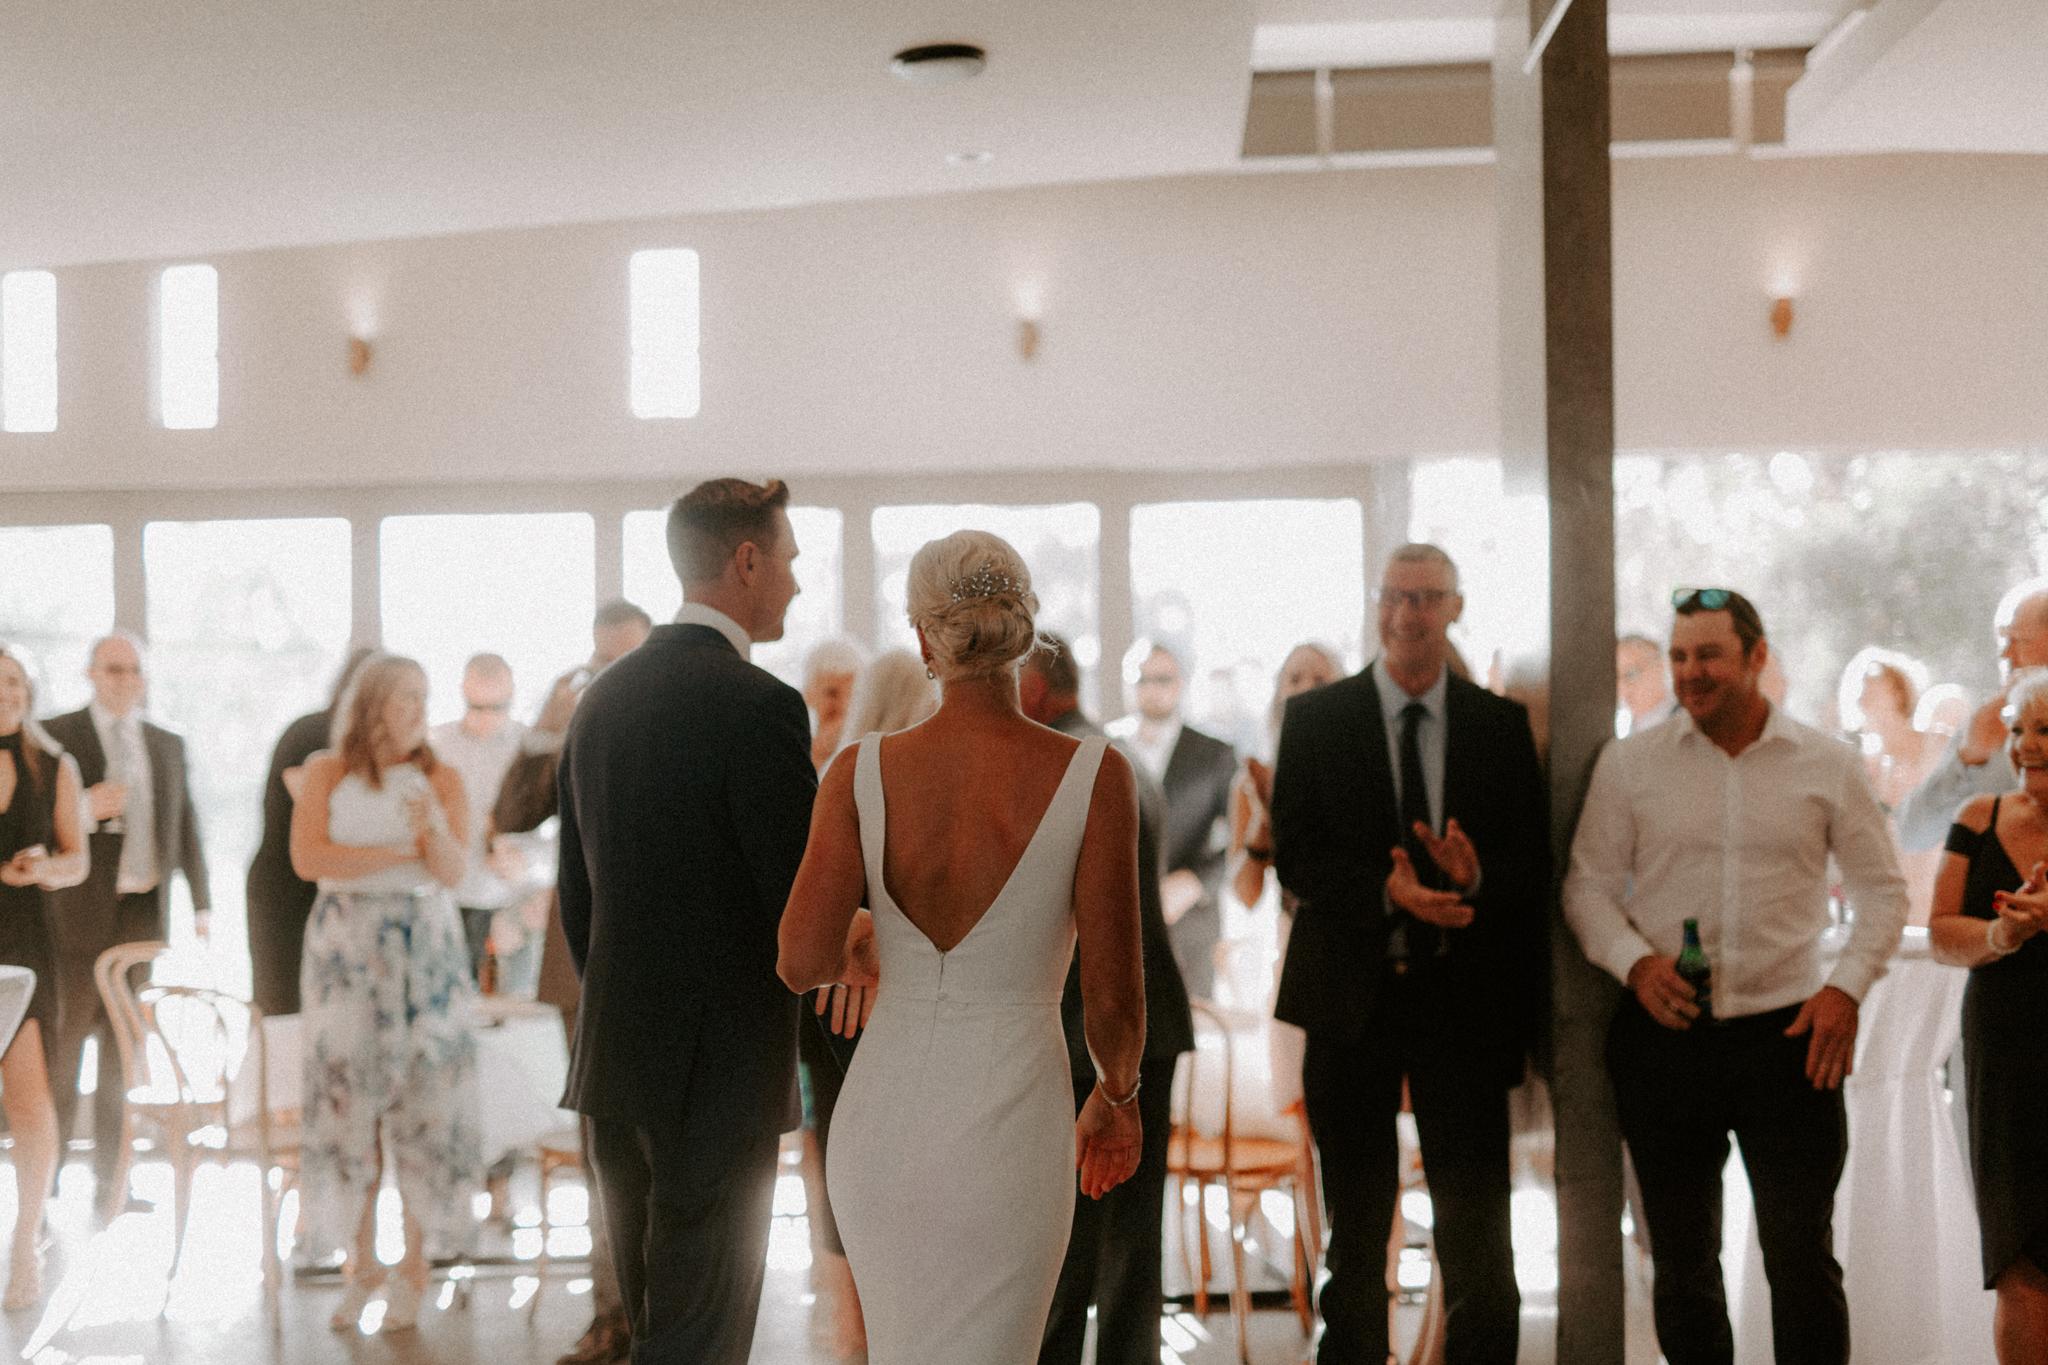 St-Kilda-Garden-Wedding-Emotions-and-Math-Photograph-184.jpg